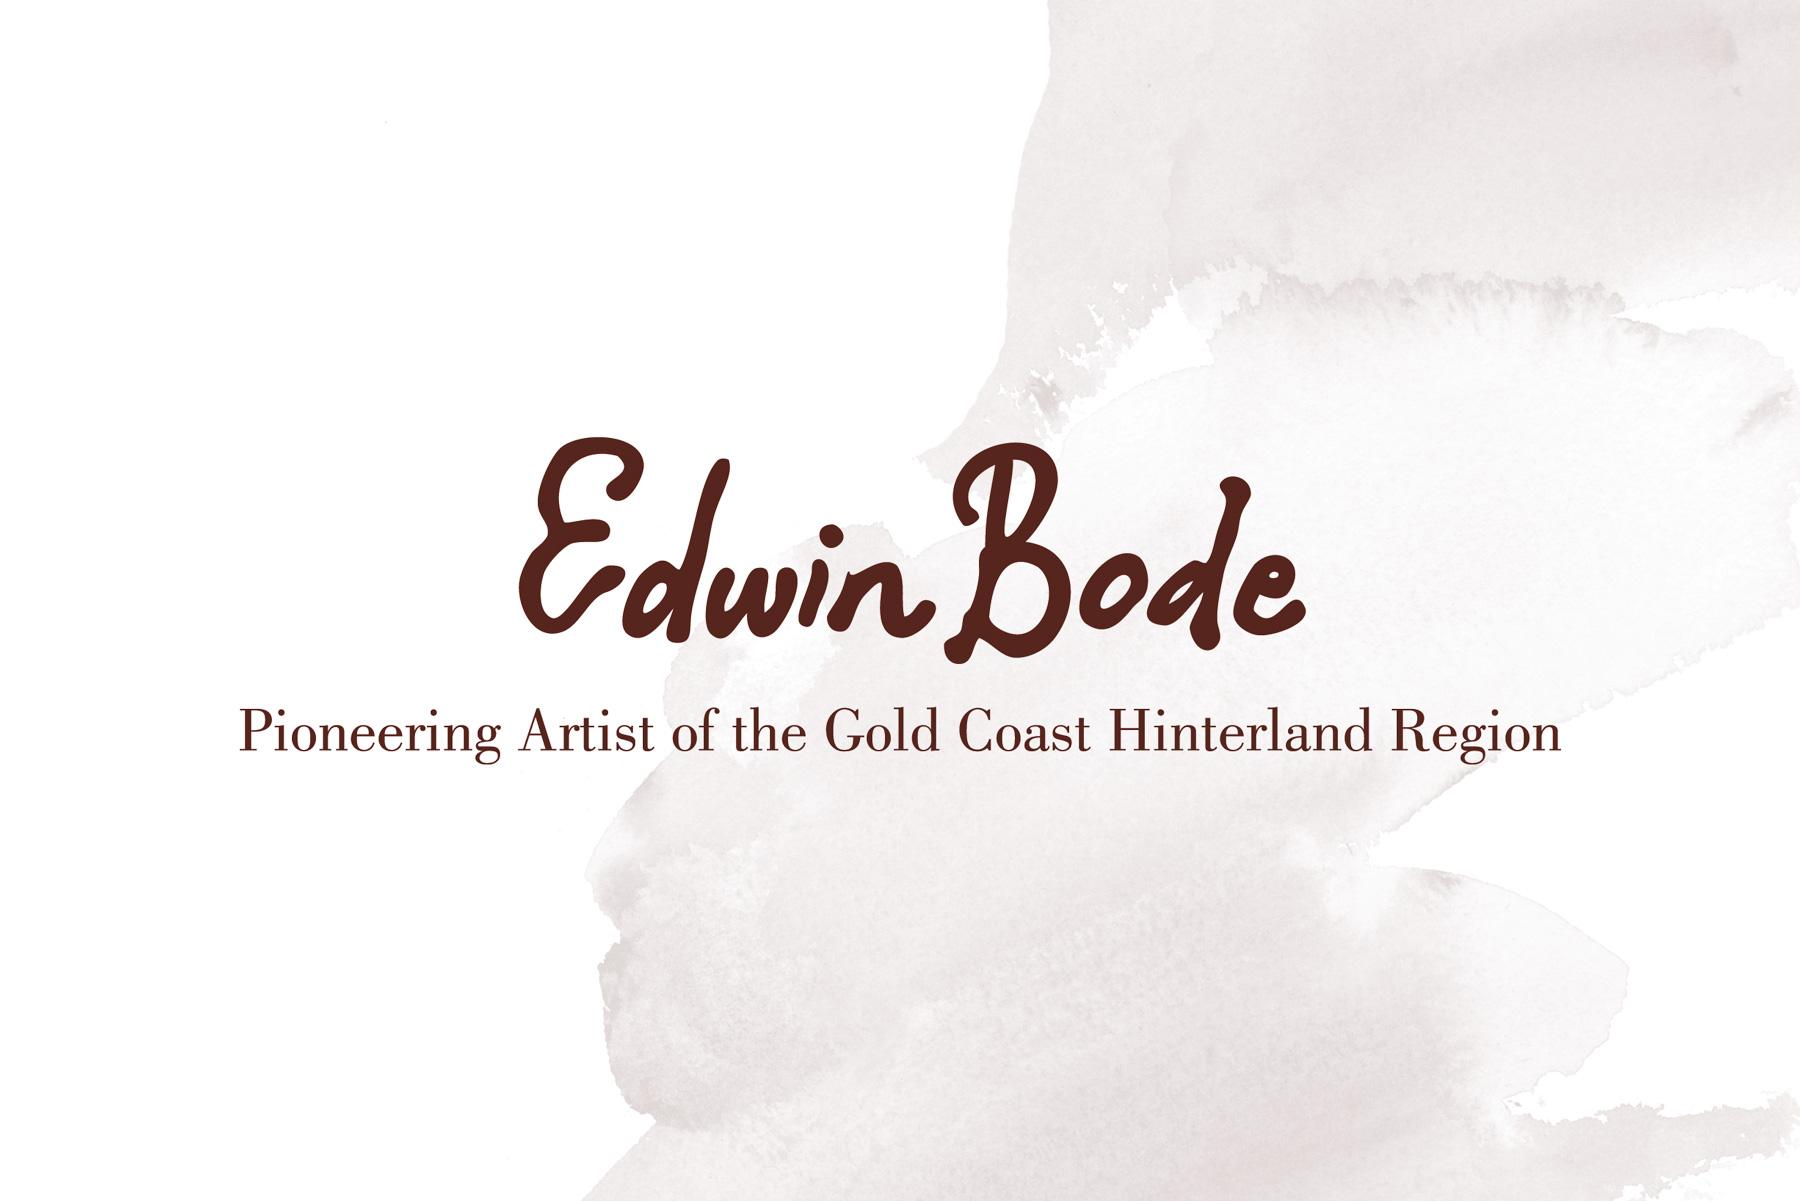 Logo design by Art-Work Agency, Graphic Design Gold Coast